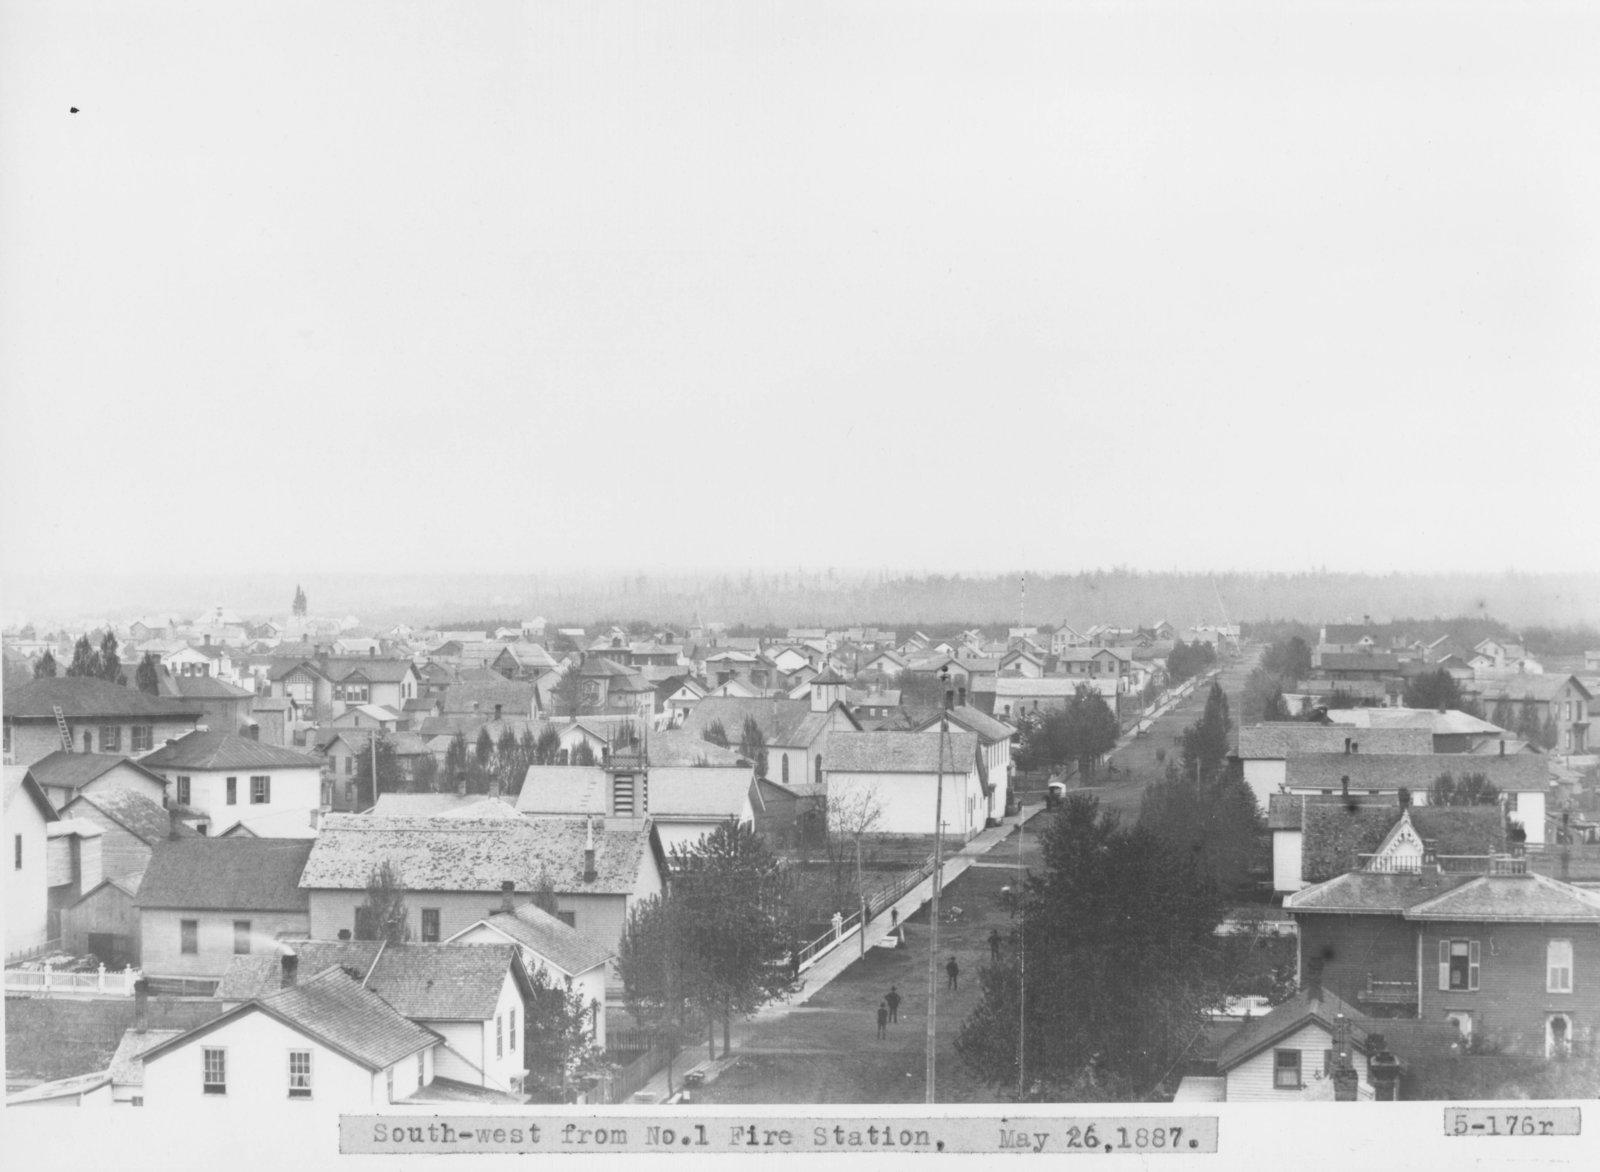 Residential Area of Alpena, Michigan